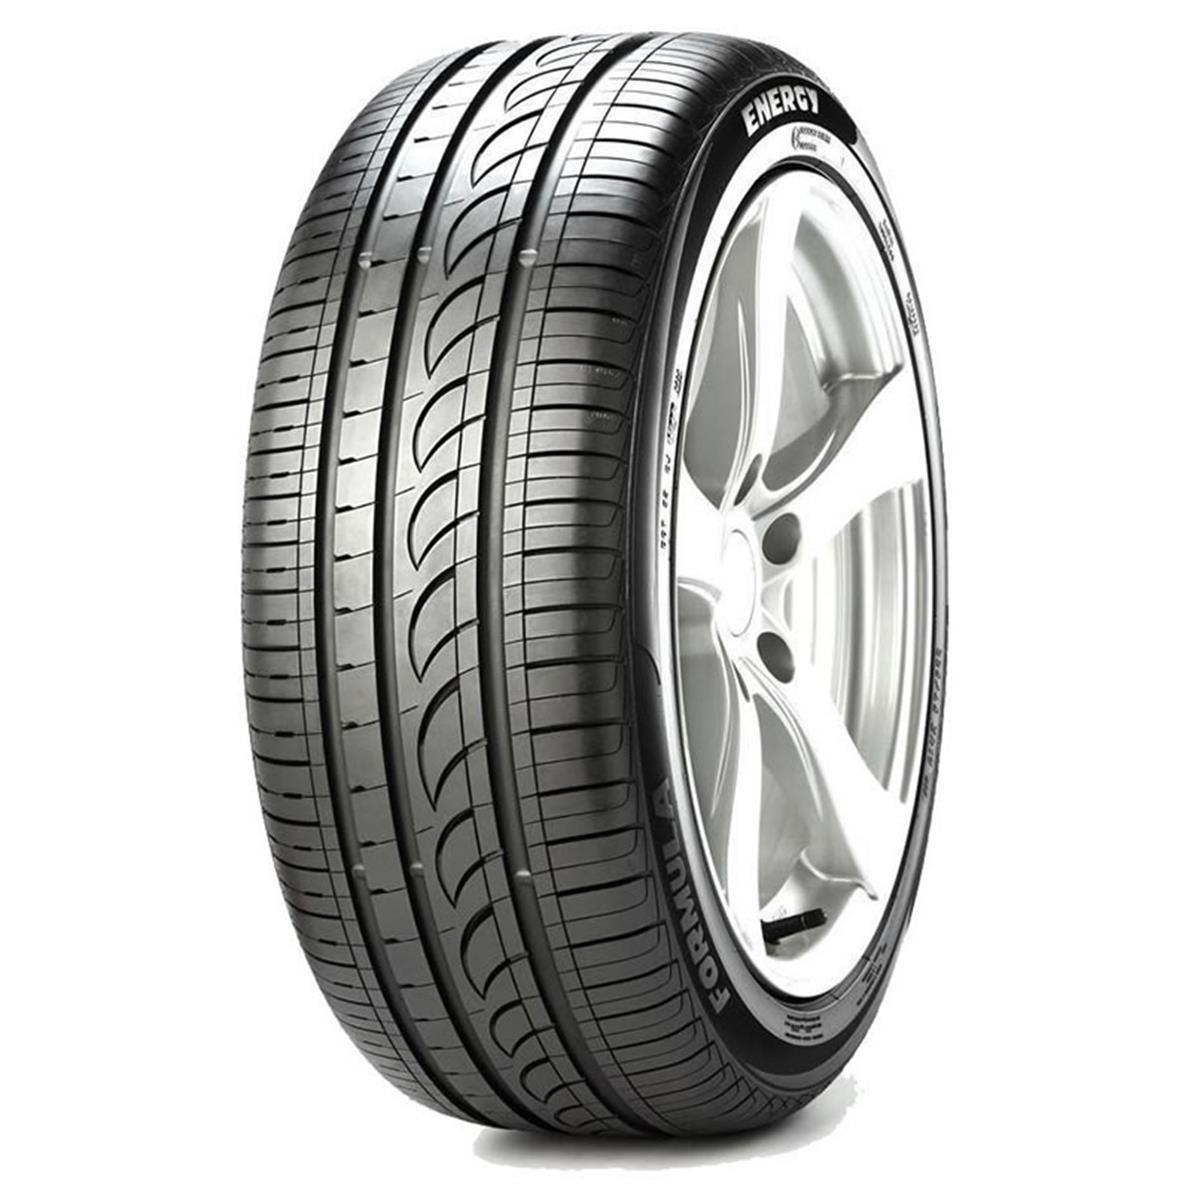 Pneu 175/65 R 14 - Formula Energy 82t - Pirelli